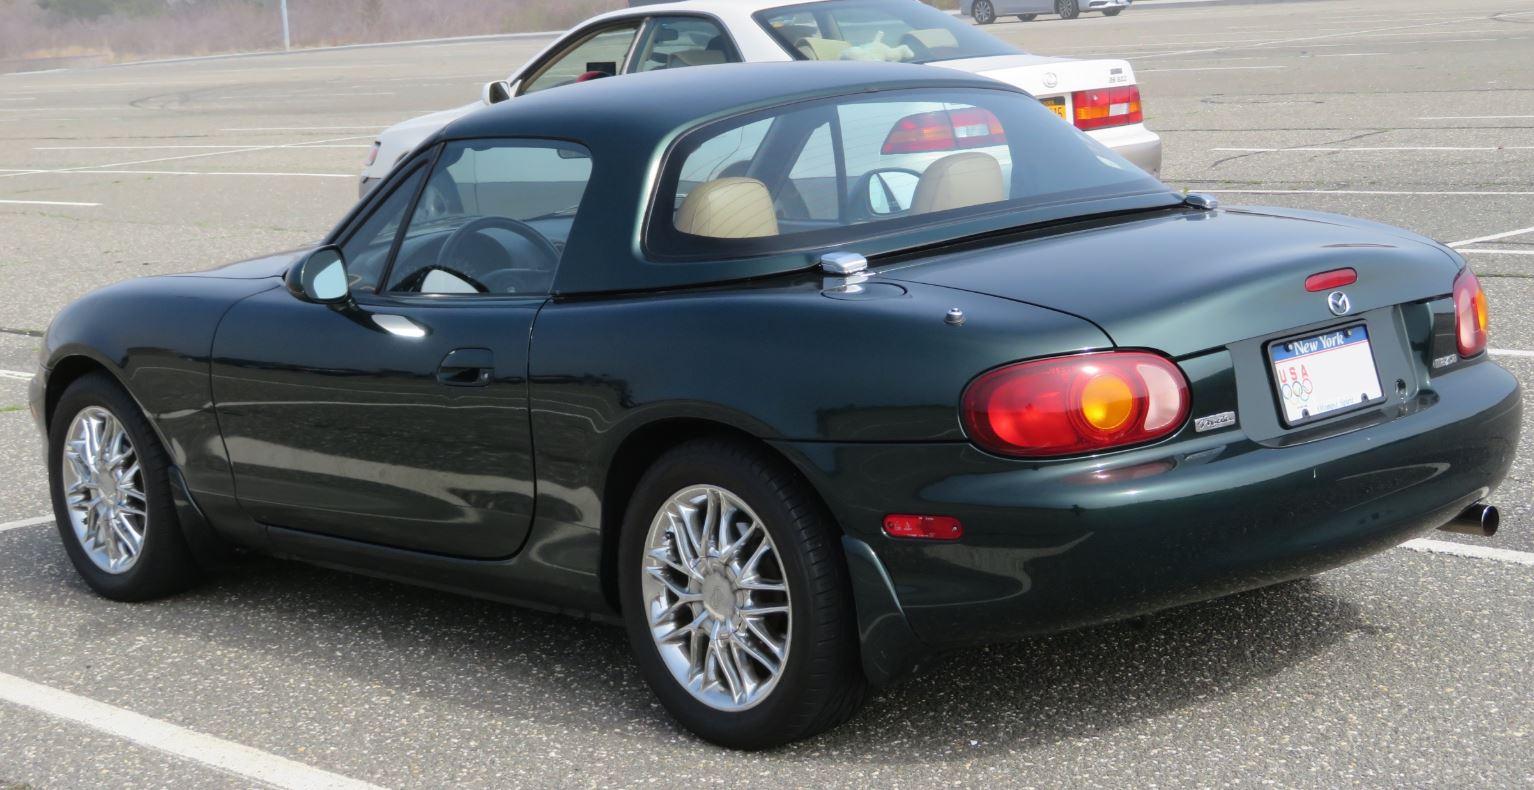 Mazda MX-5 Miata Buying Guide - Every Generation - Garage Dreams